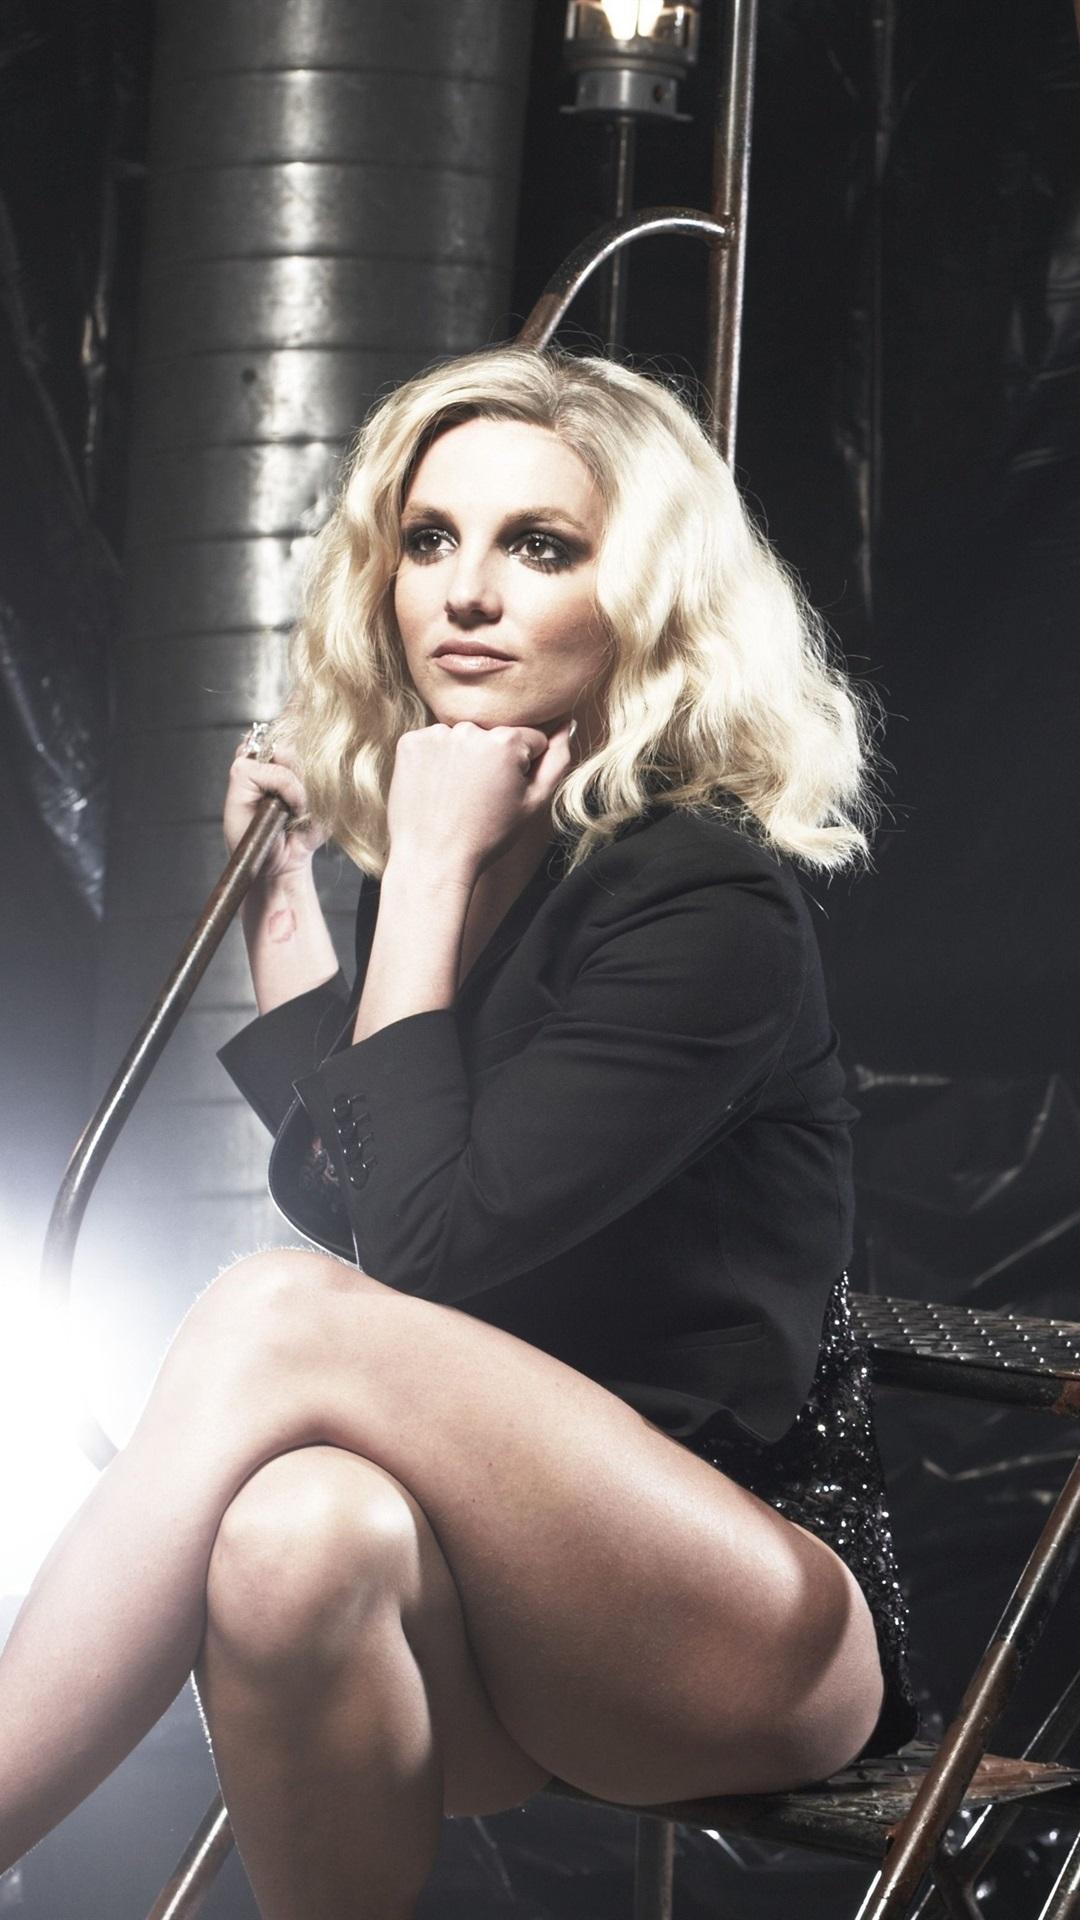 Iphone Wallpaper Britney Spears Britney Spears Wallpaper Phone 1080x1920 Download Hd Wallpaper Wallpapertip